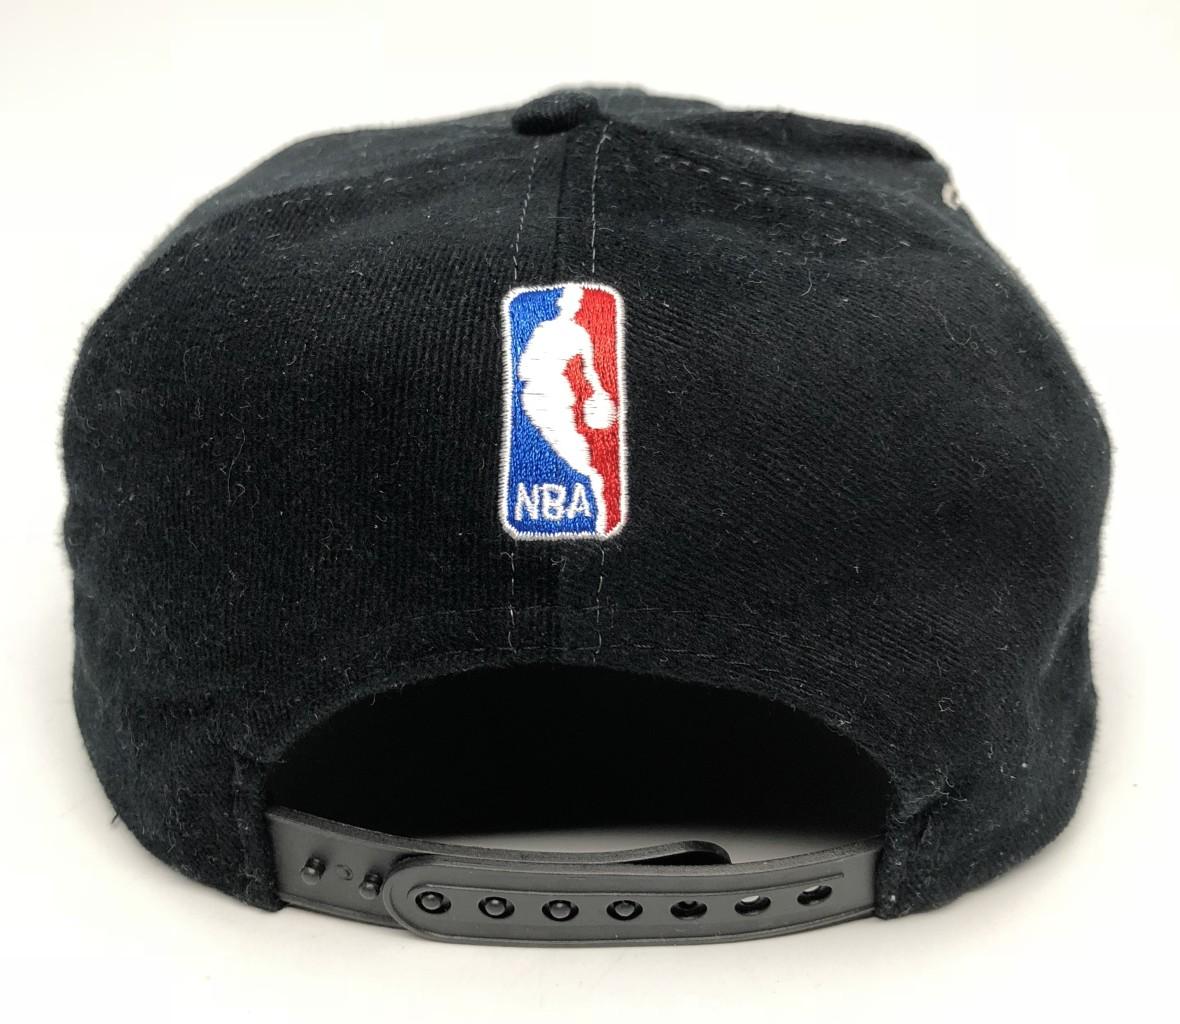 30db82e6b3e 1997 vintage Chicago Bulls NBA Champions Locker Room Logo Athletic snapback  hat